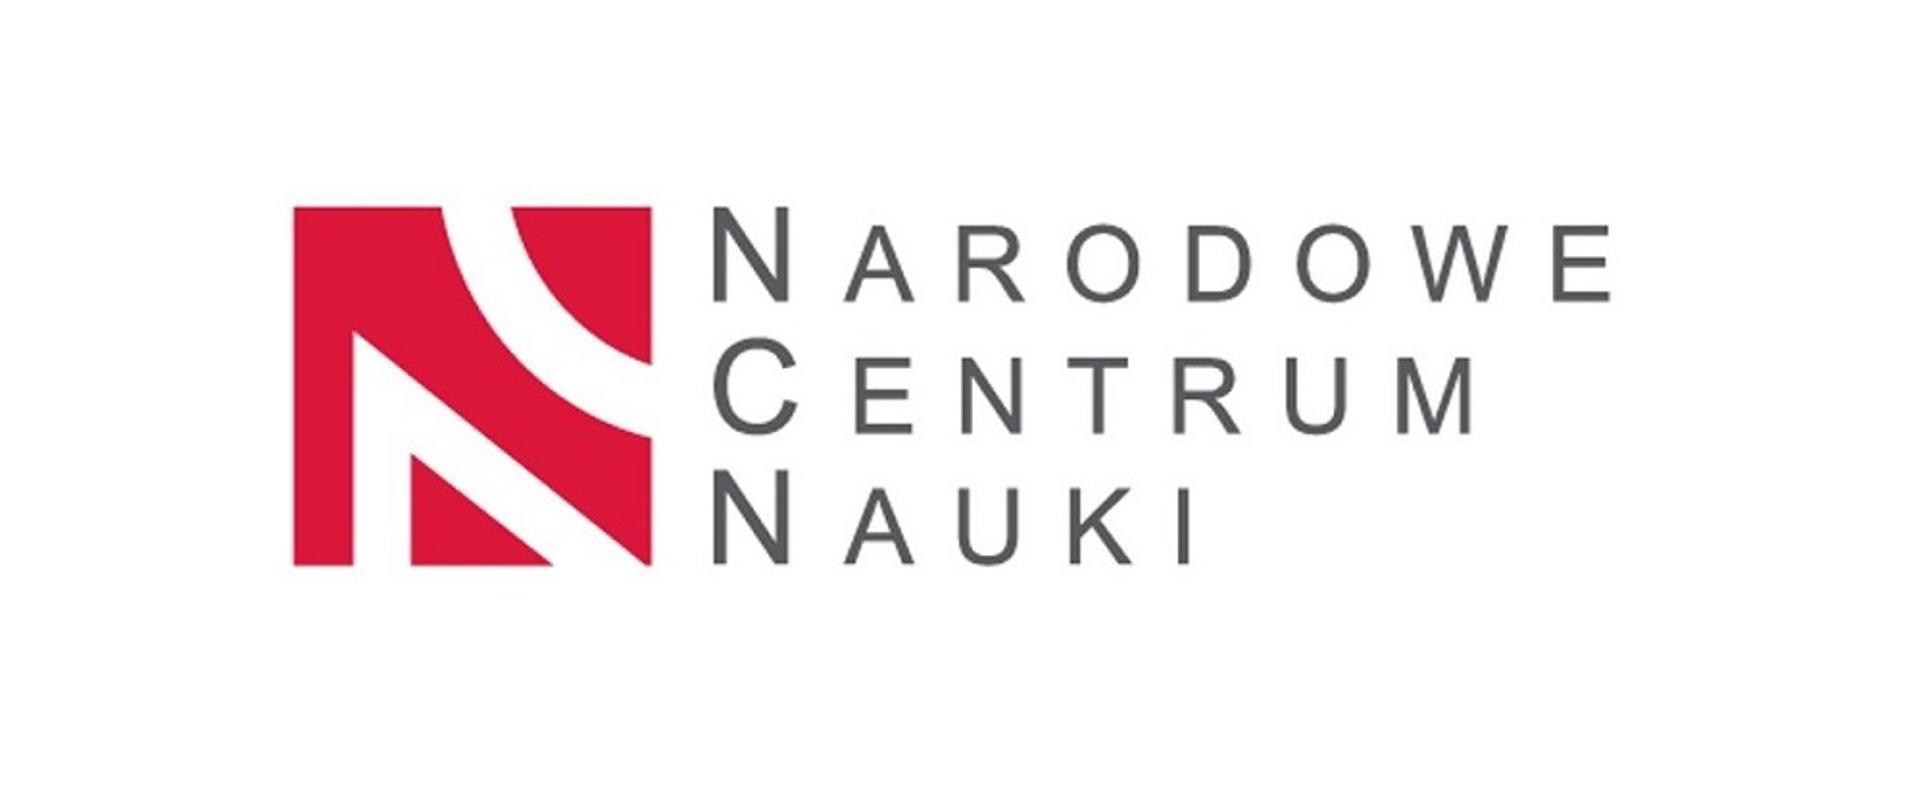 grant ncn - instytut kulturoznawstwa